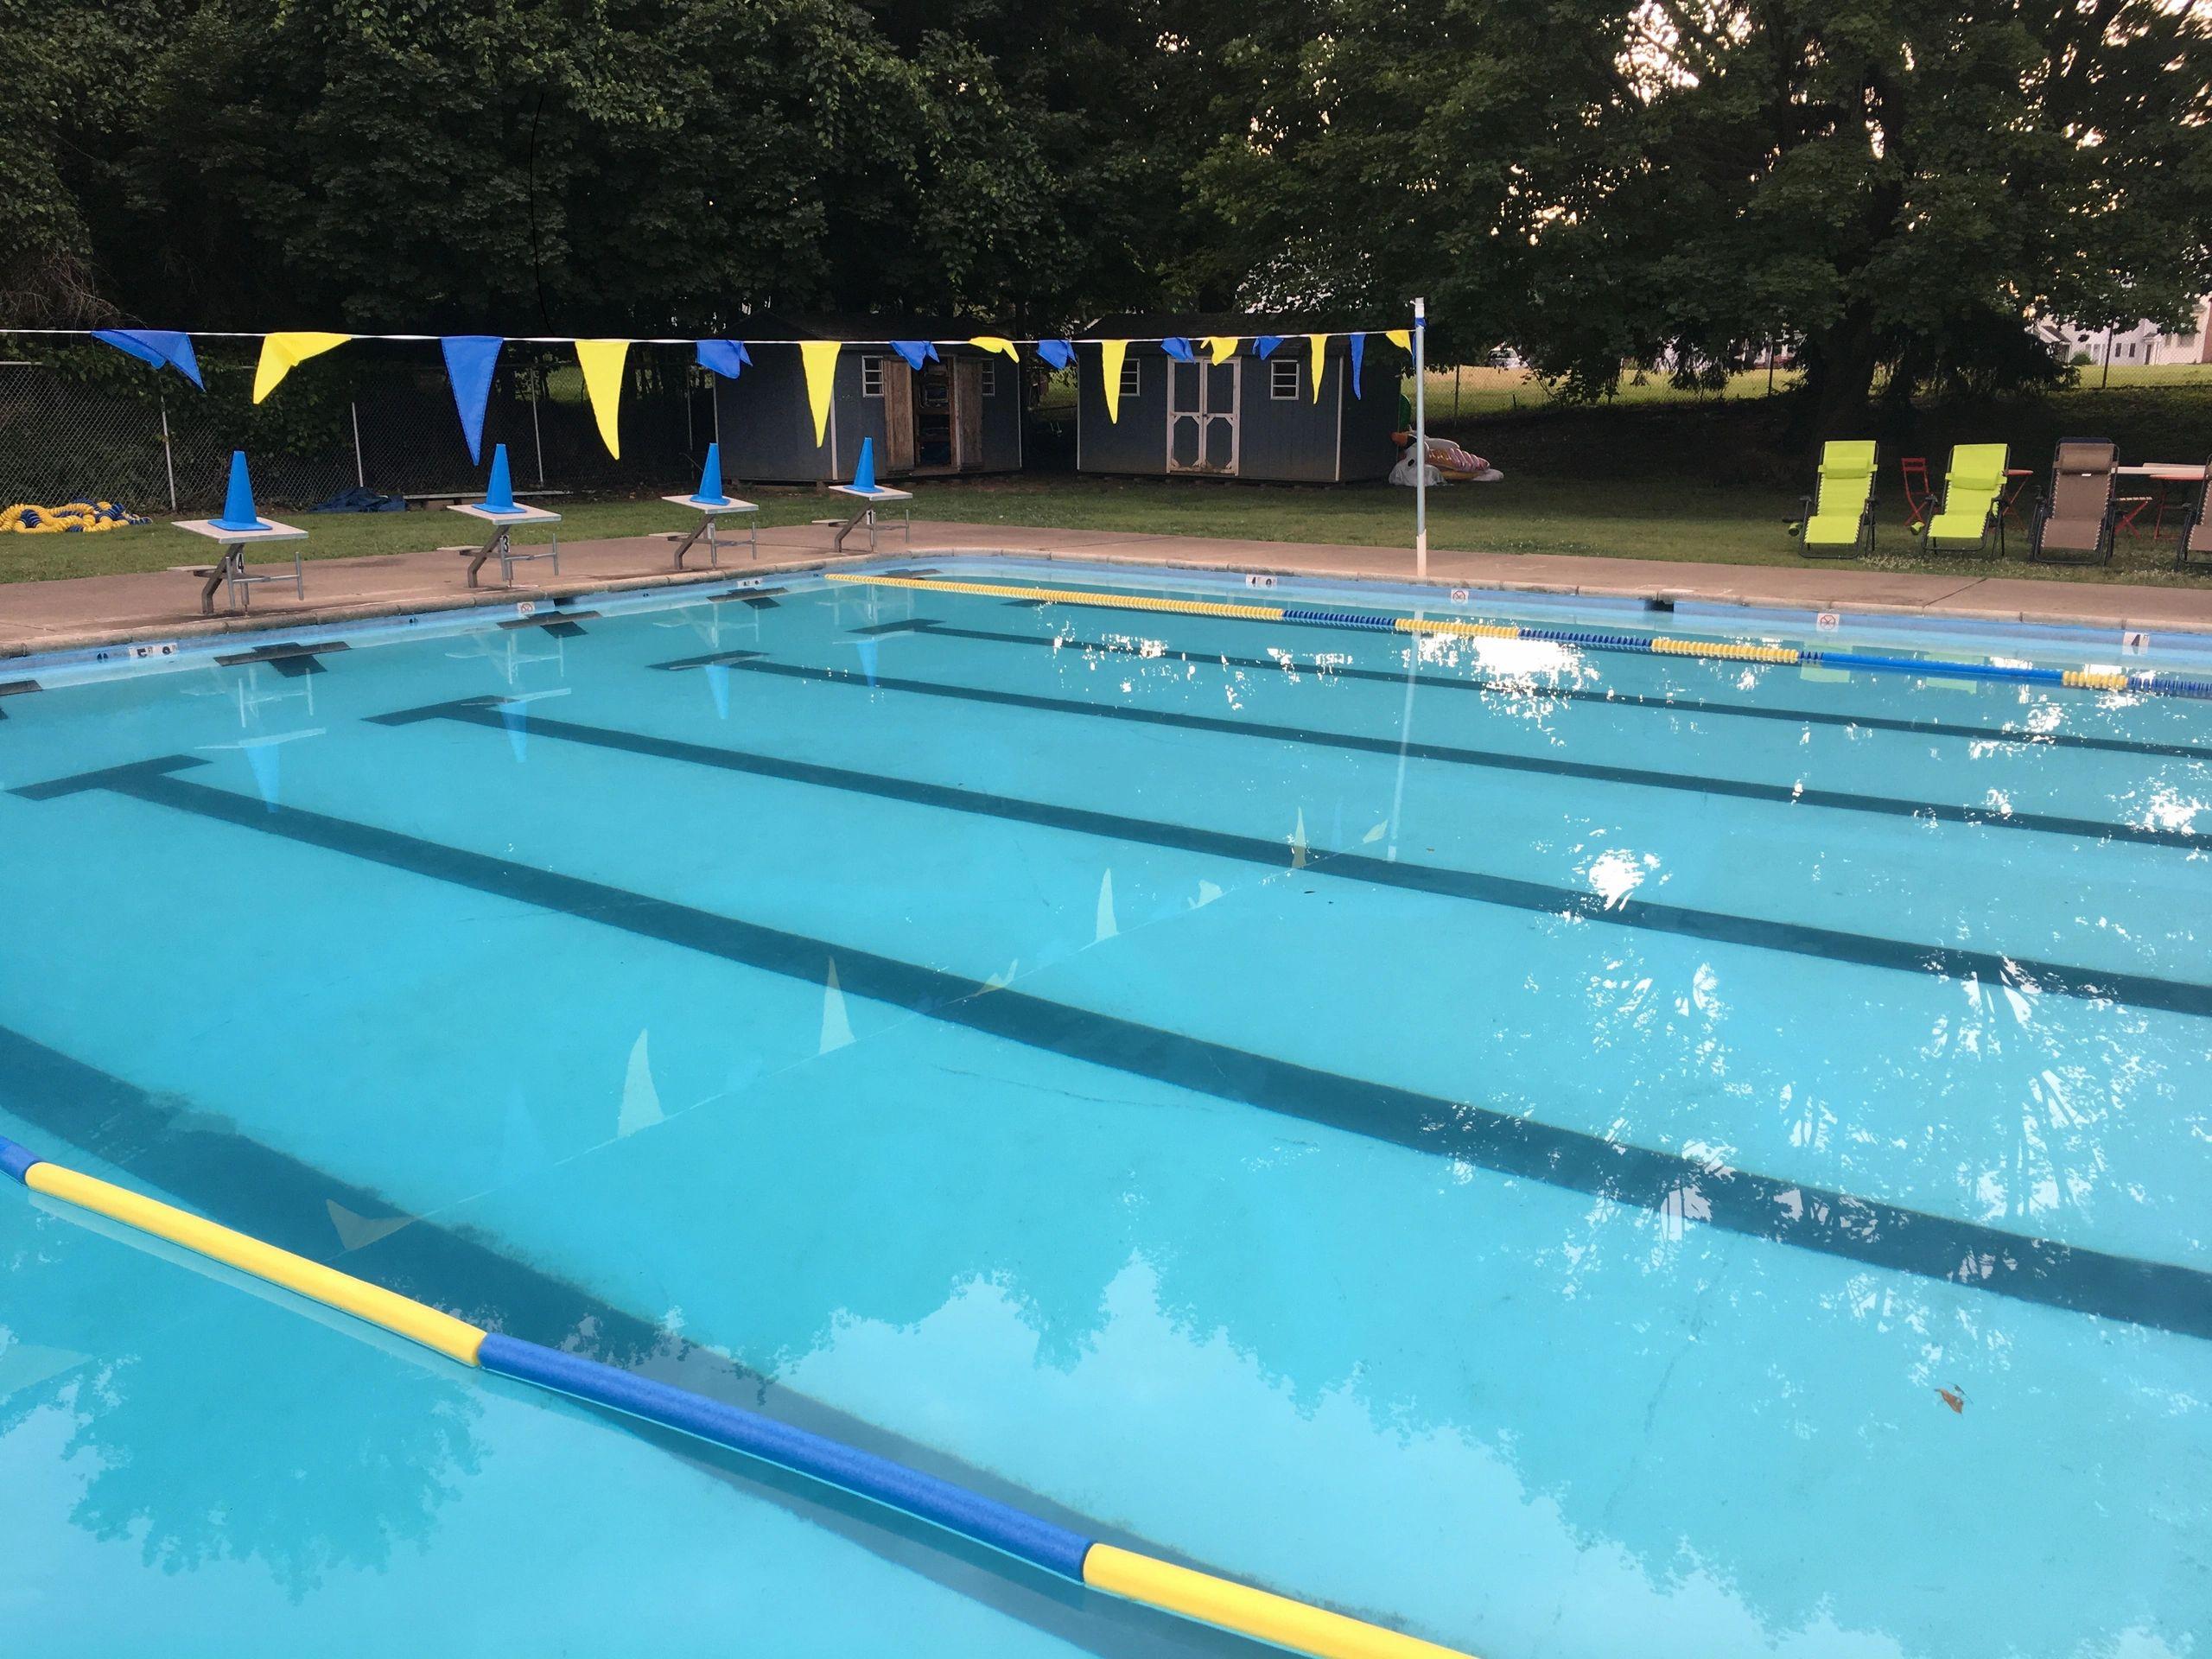 Stones Crossing Swim Club - Swimming Pool - Easton, Pennsylvania